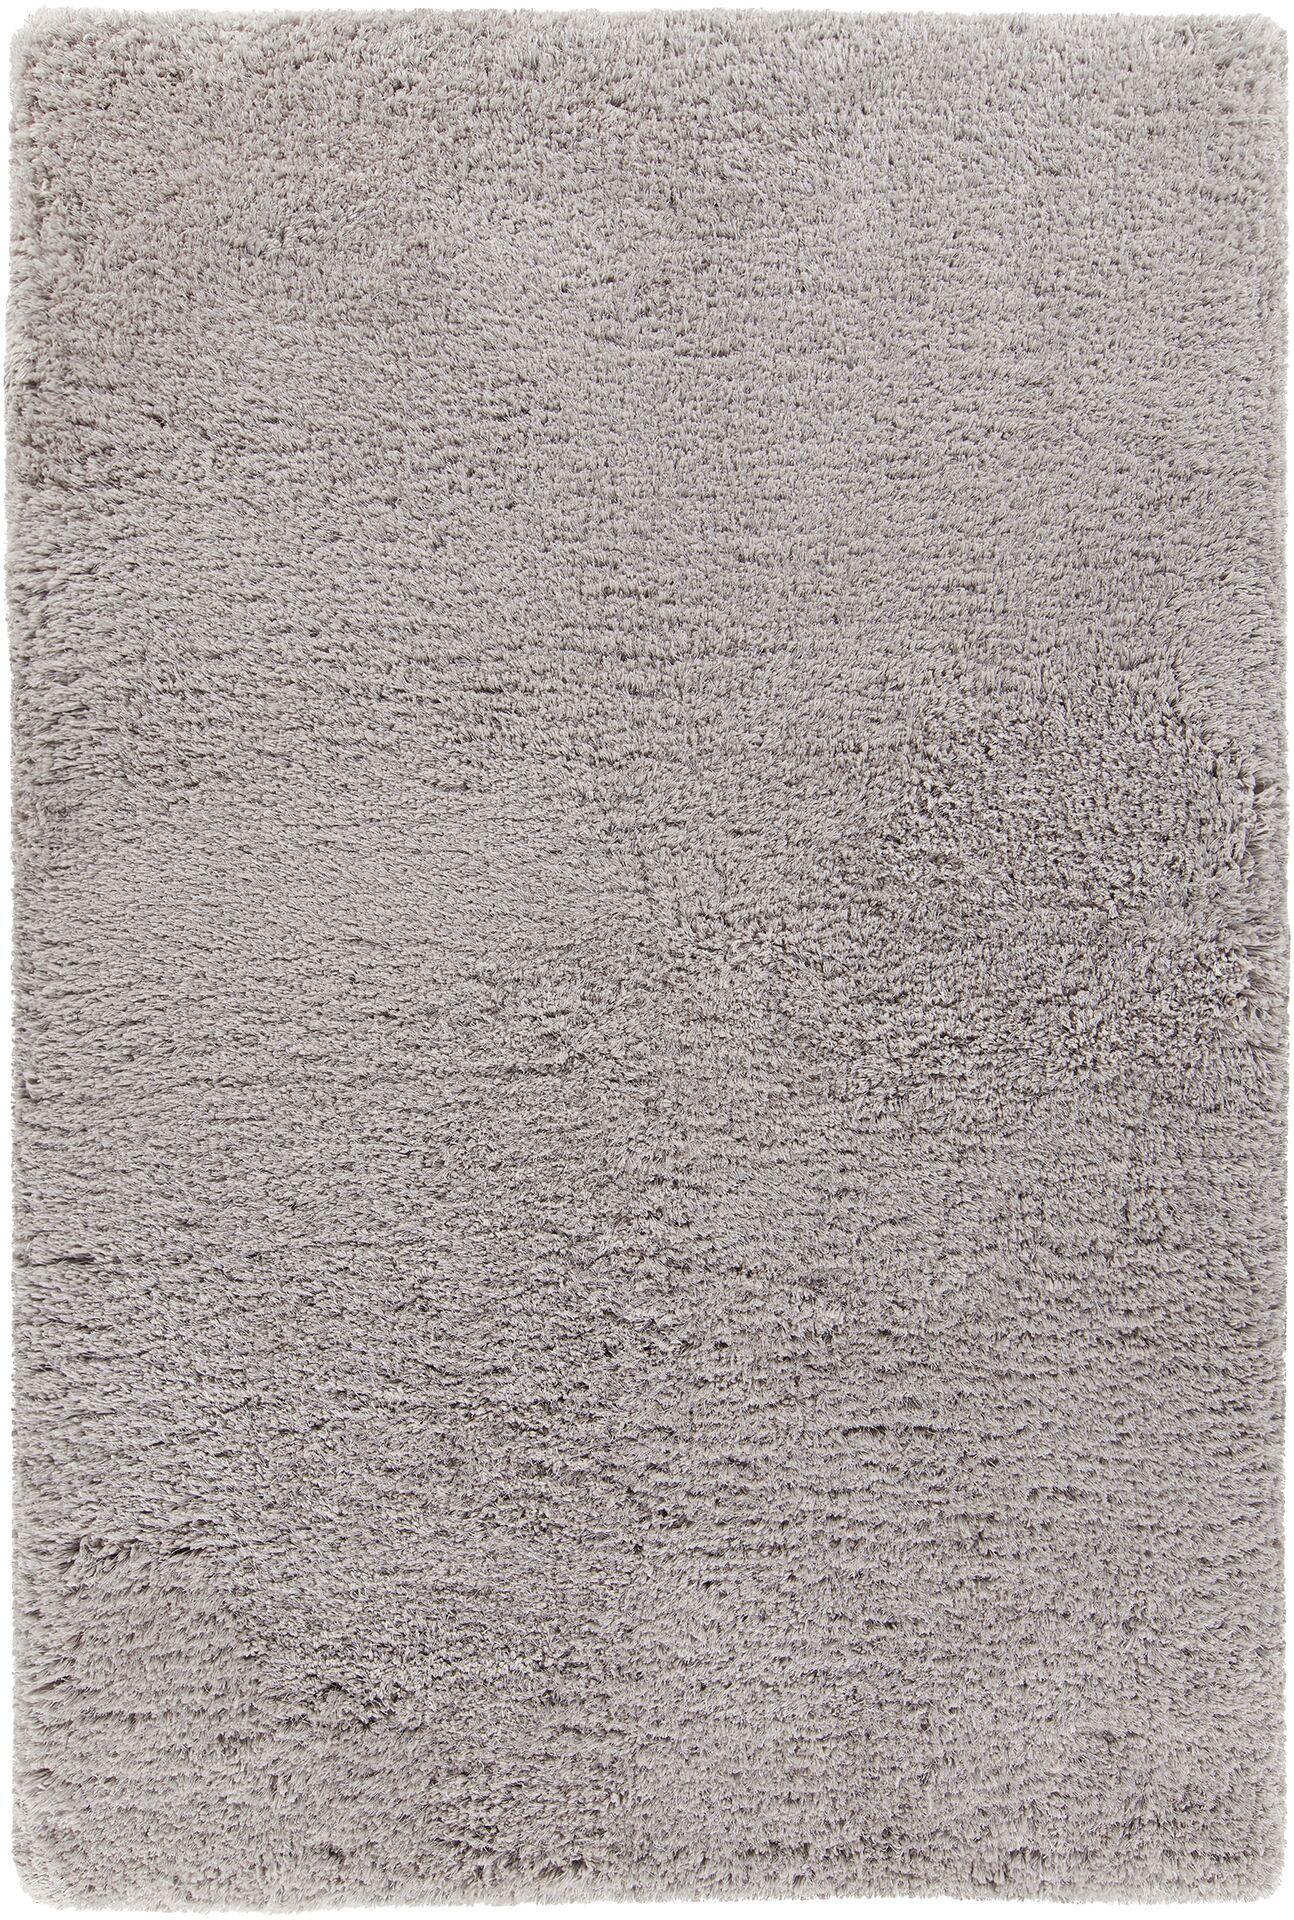 Garretson Hand-Woven Silver Area Rug Rug Size: 9' x 13'